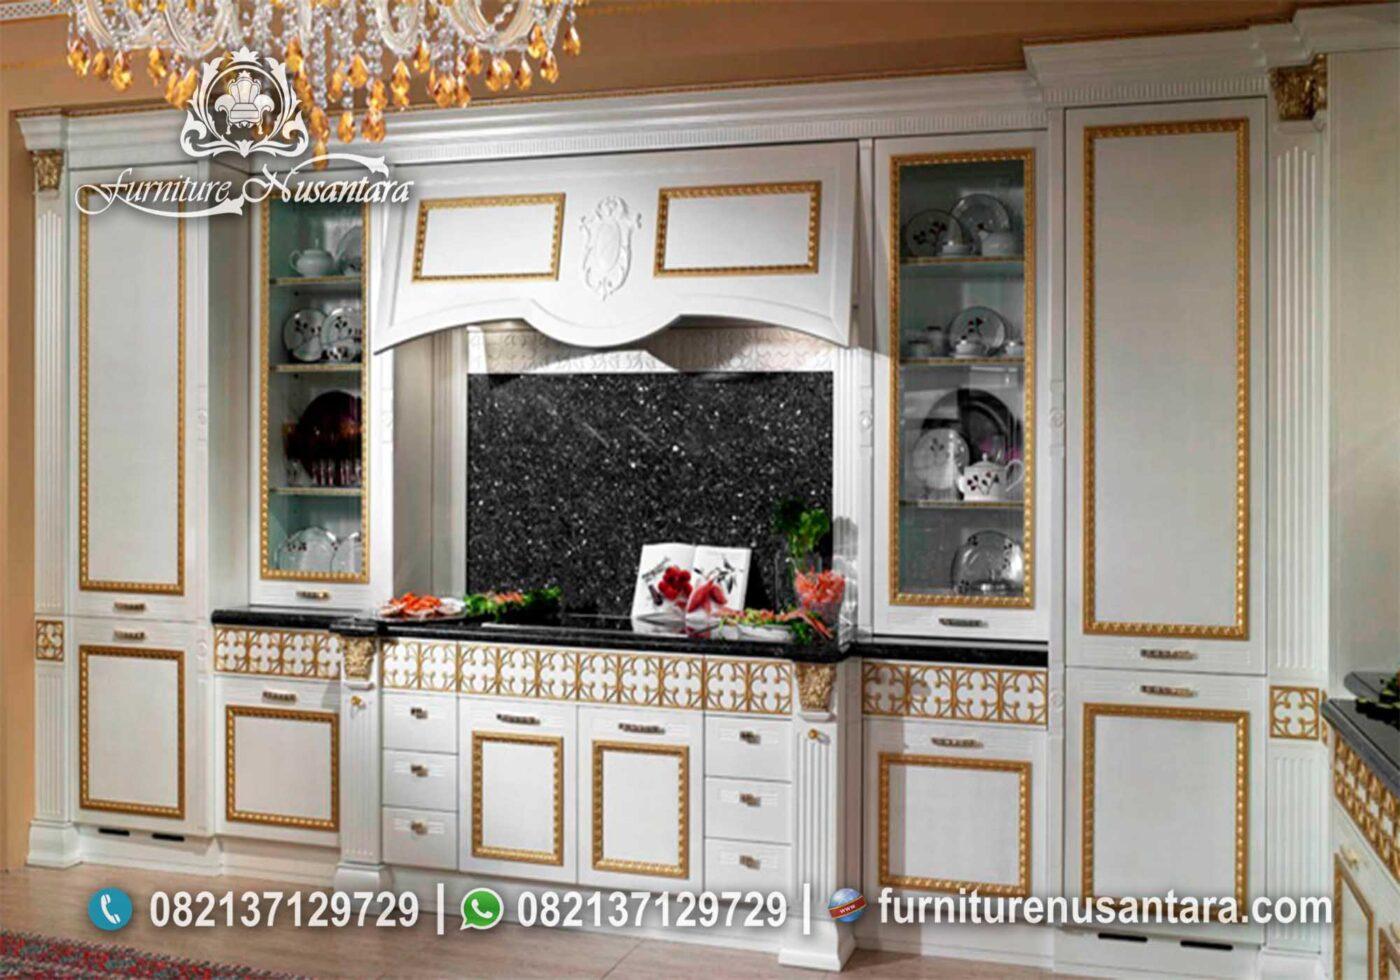 Desain Kitchen Simple Sederhana Harga Murah KC-13